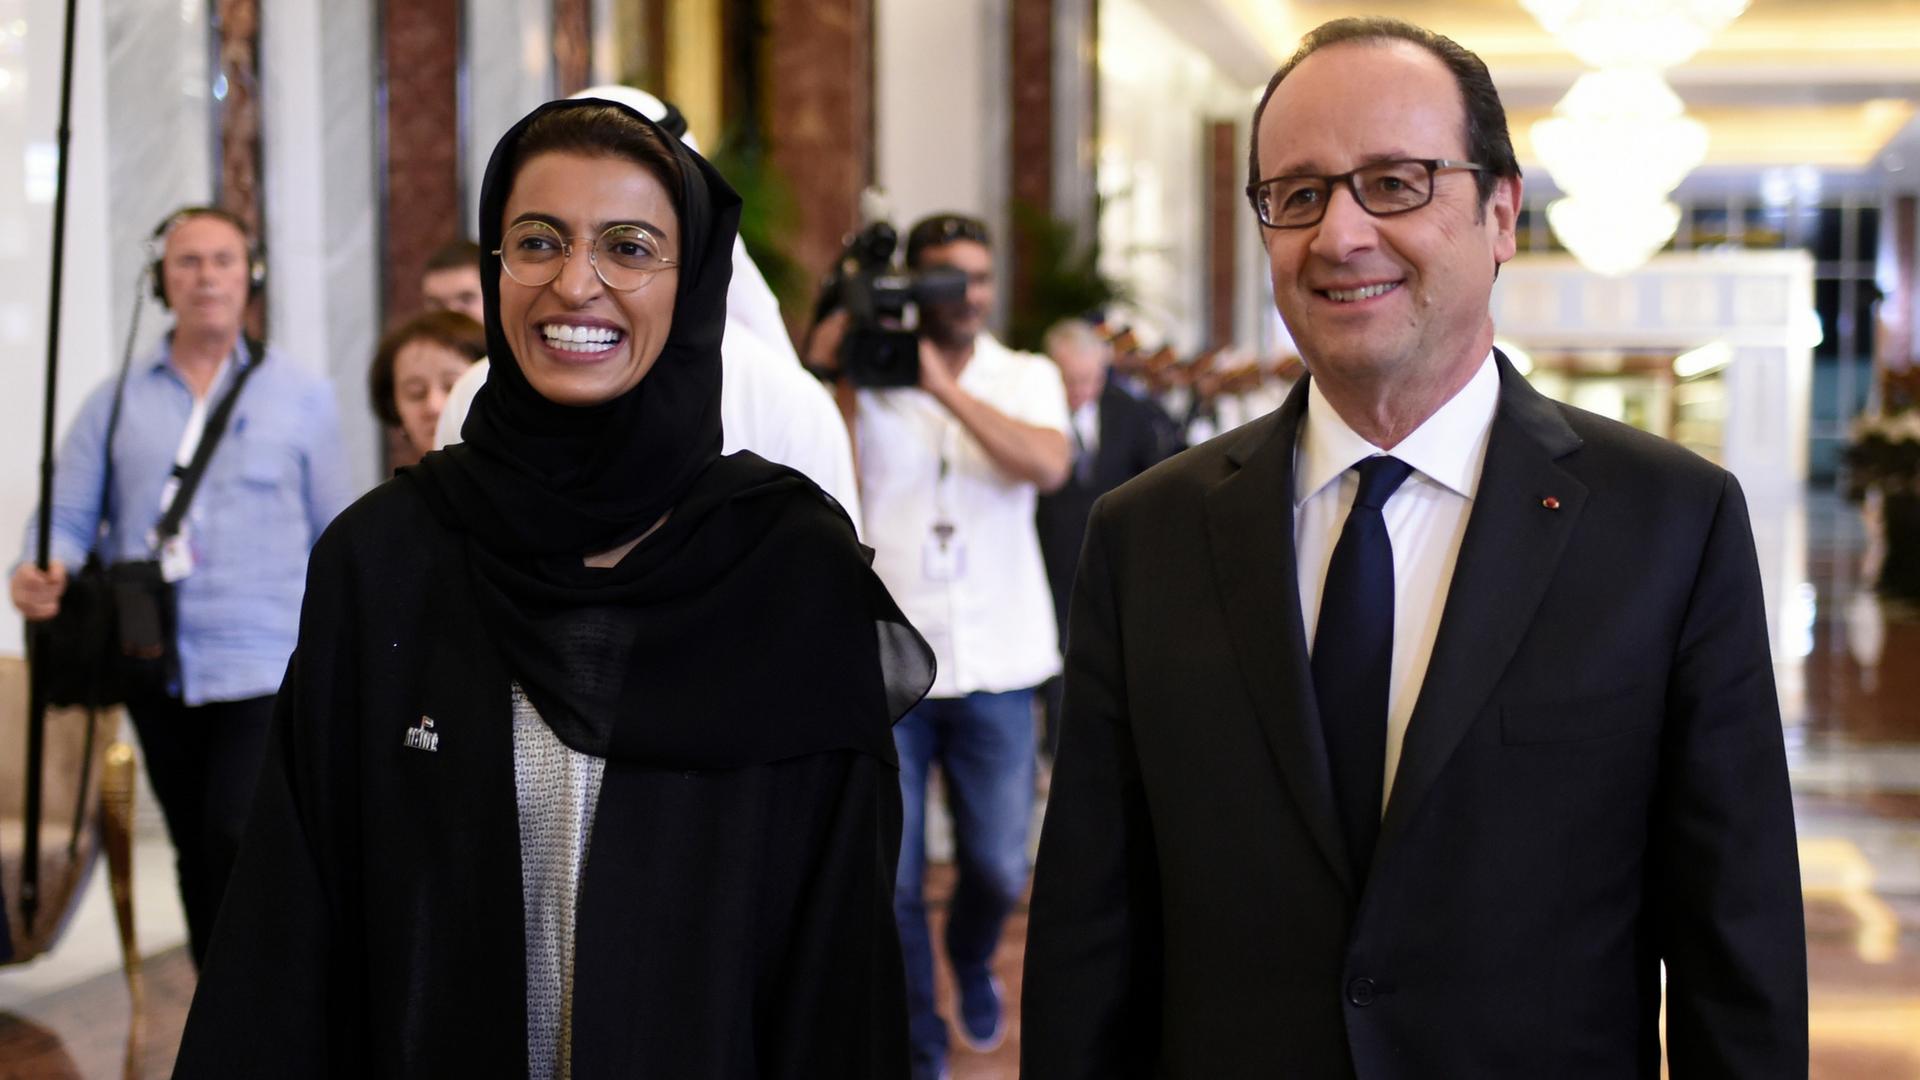 Her Excellency Noura Al Kaabi